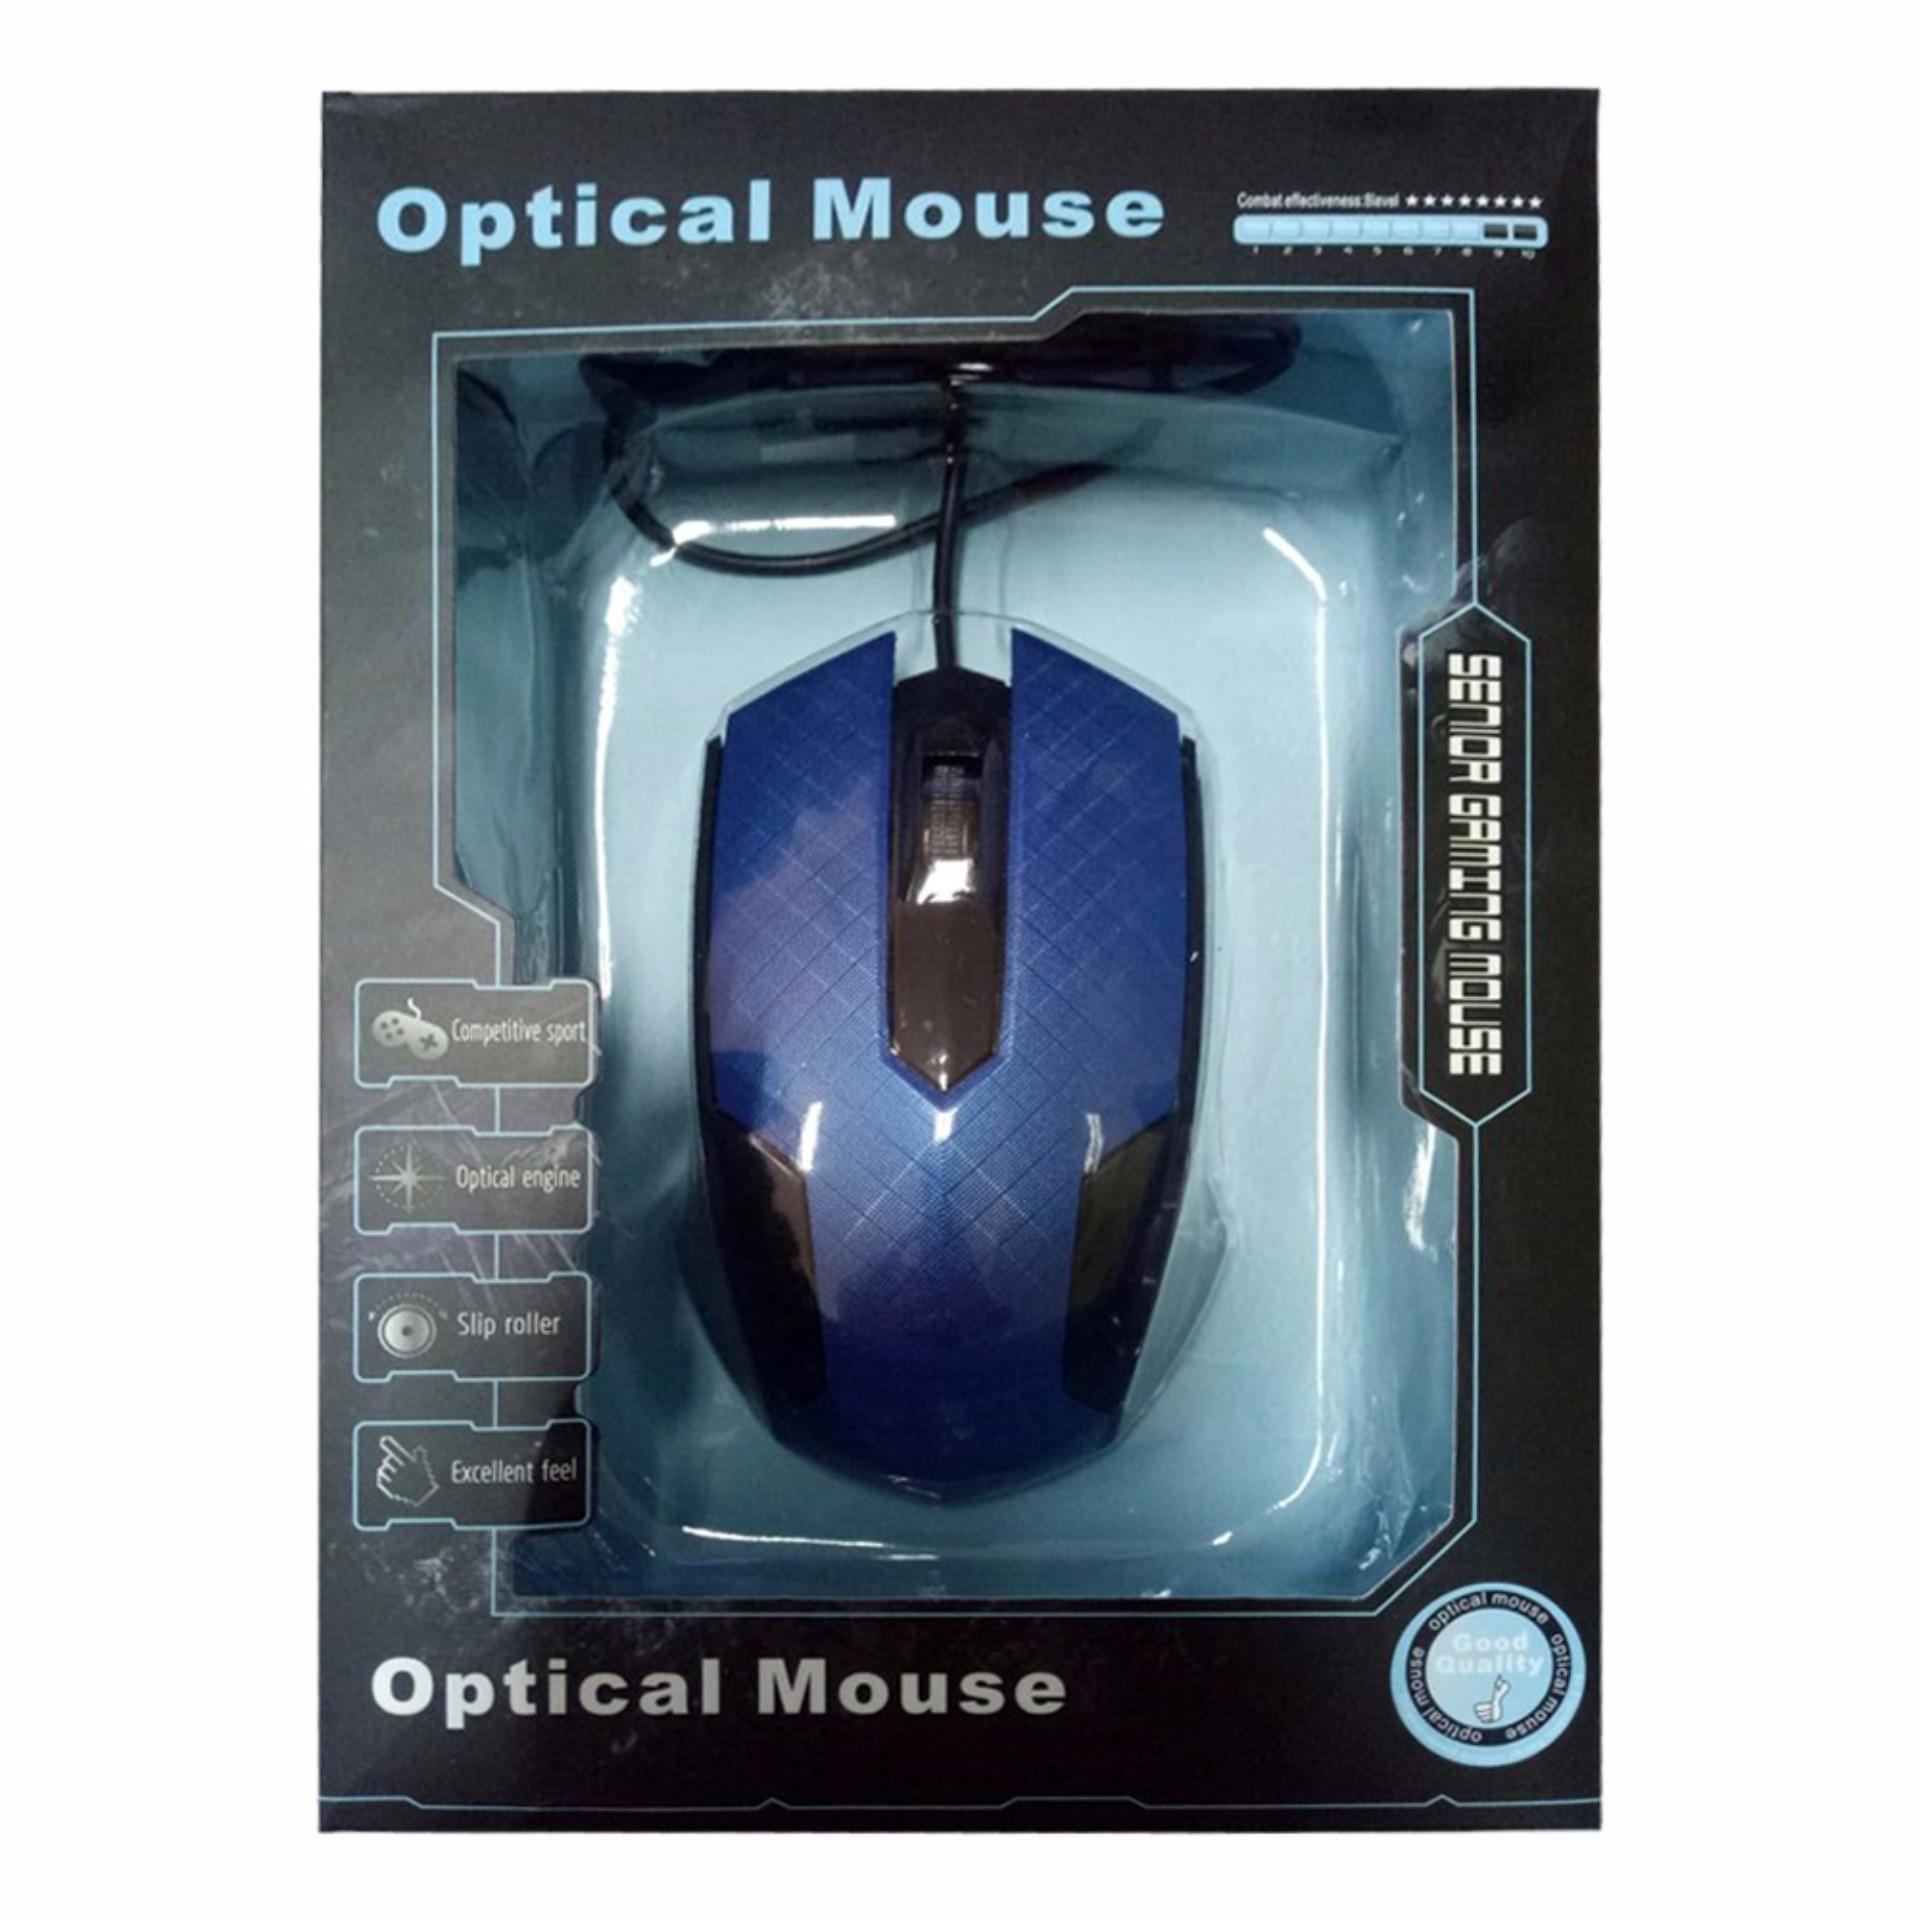 Unique Mouse Kabel 8029 Model Gaming Untuk Home Office Komputer Laptop PC